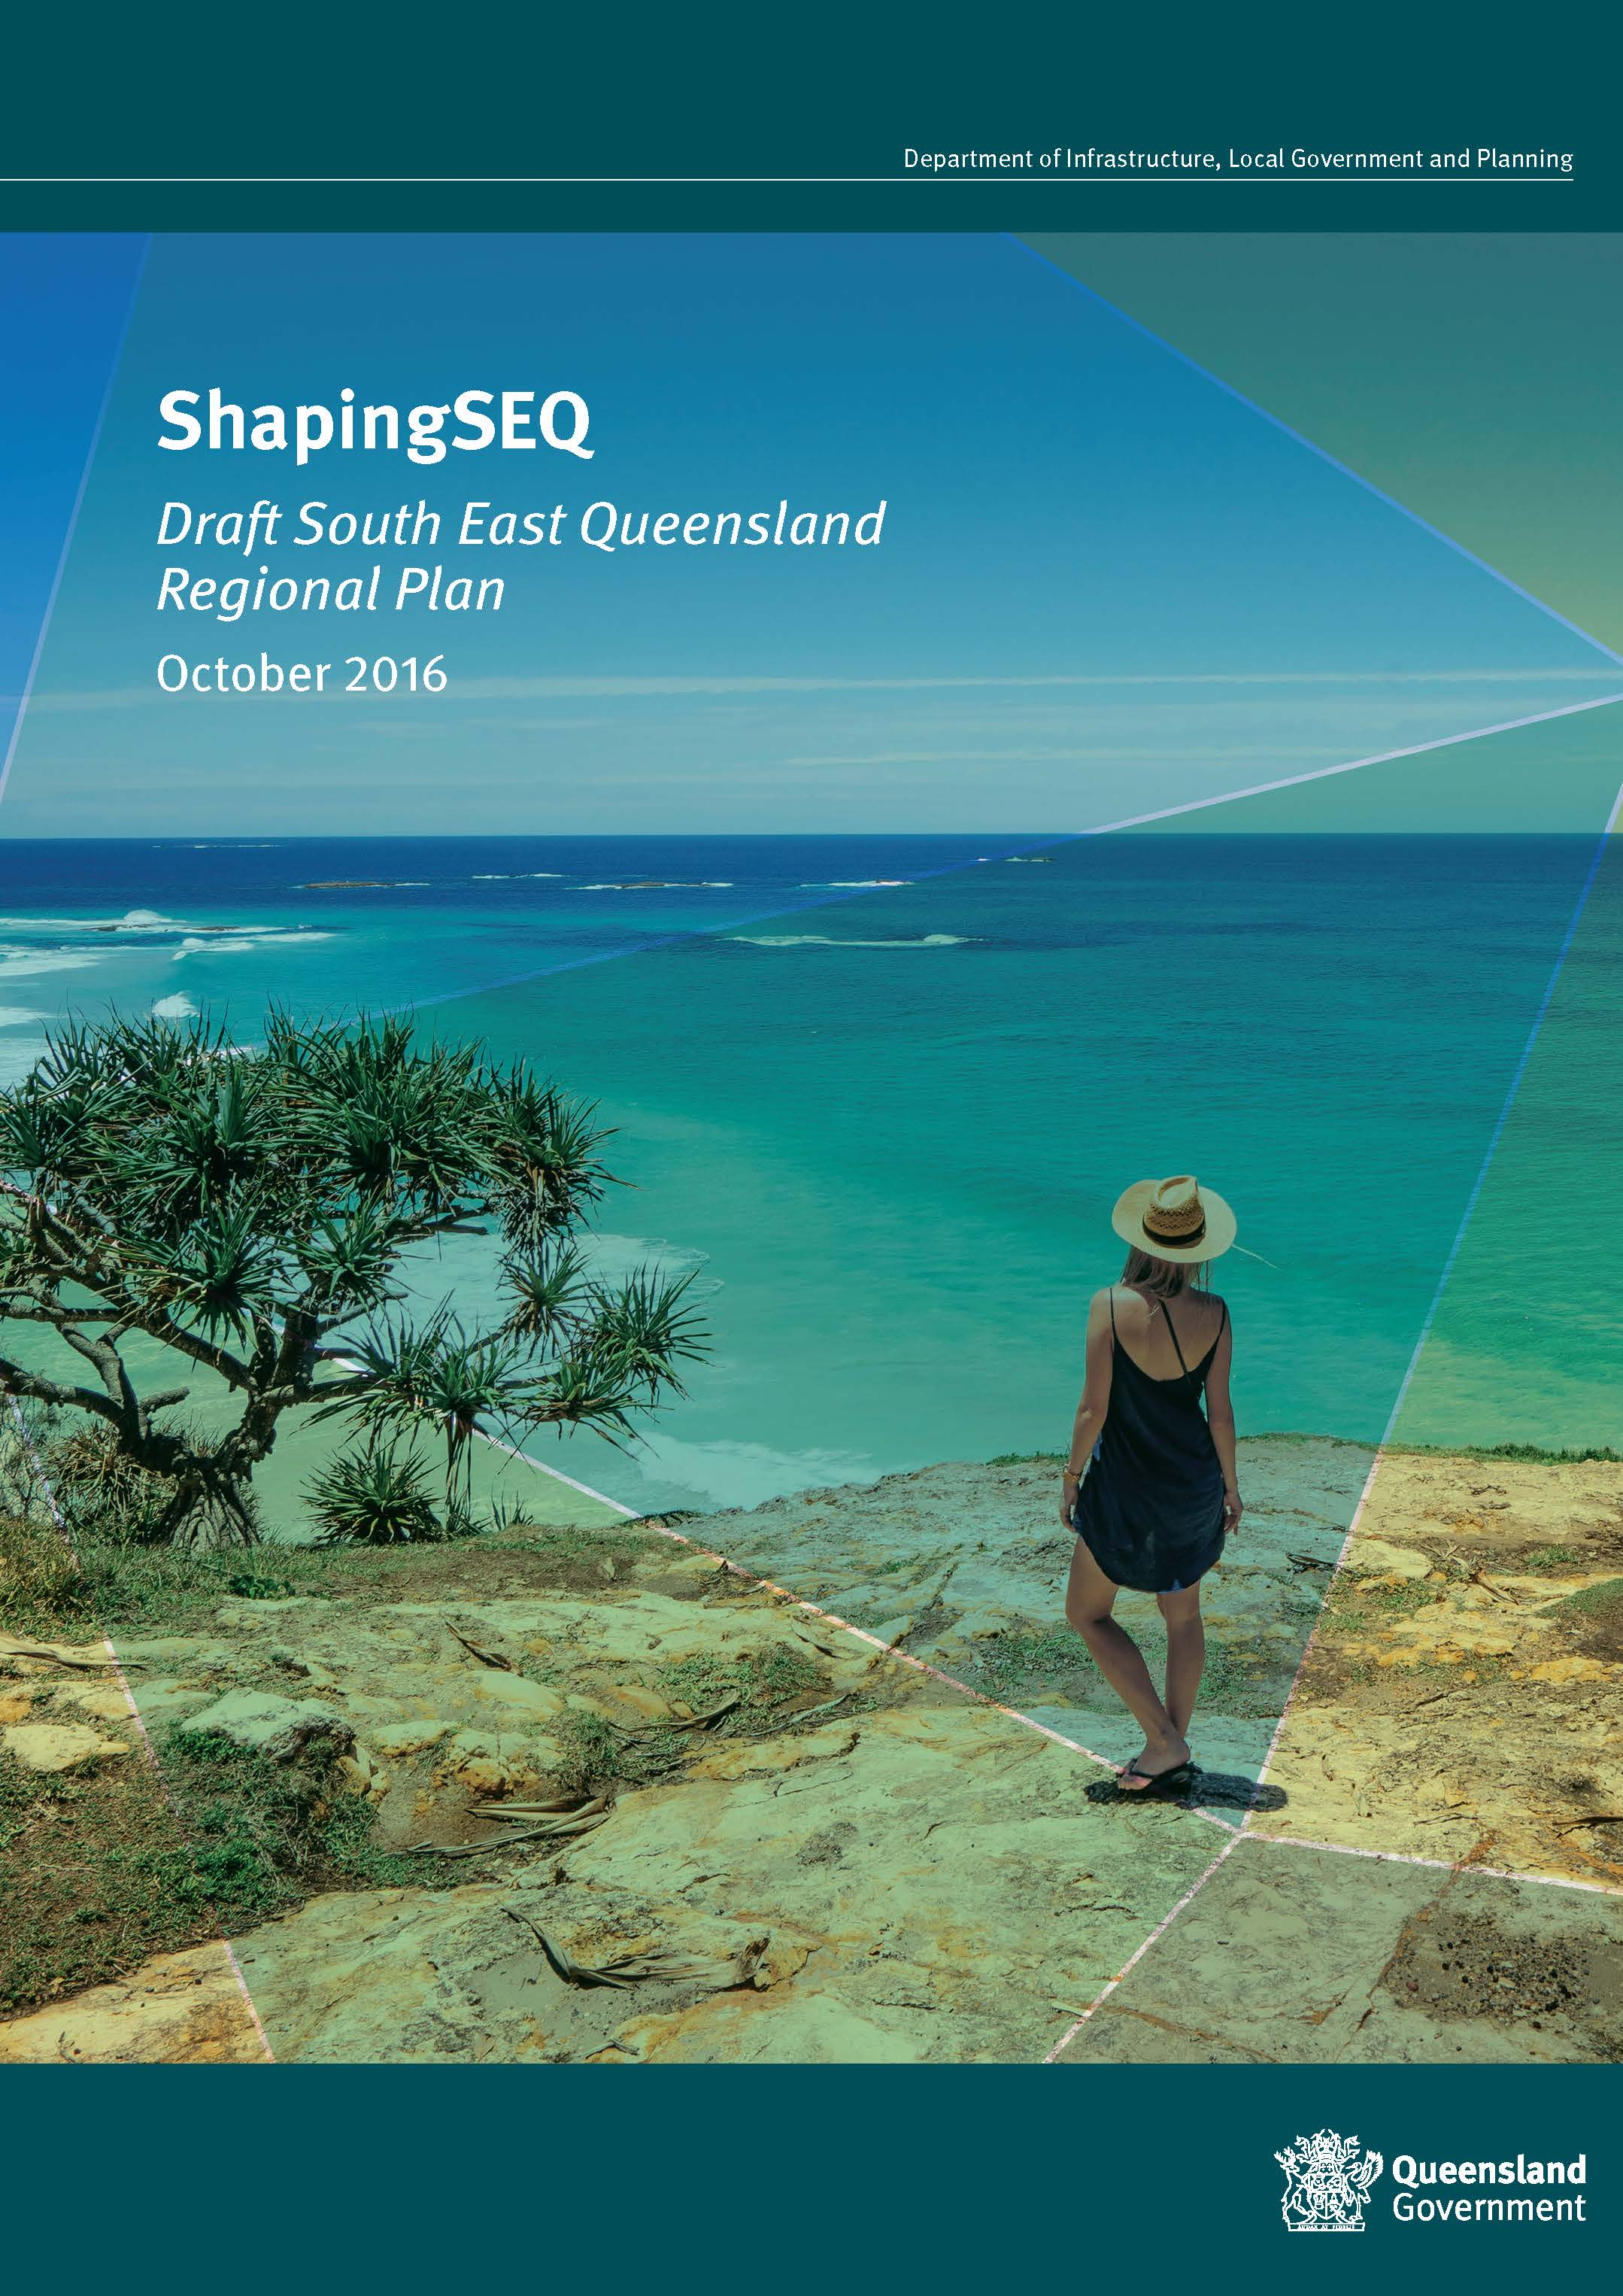 ShapingSEQ - Draft South East Queensland Regional Plan